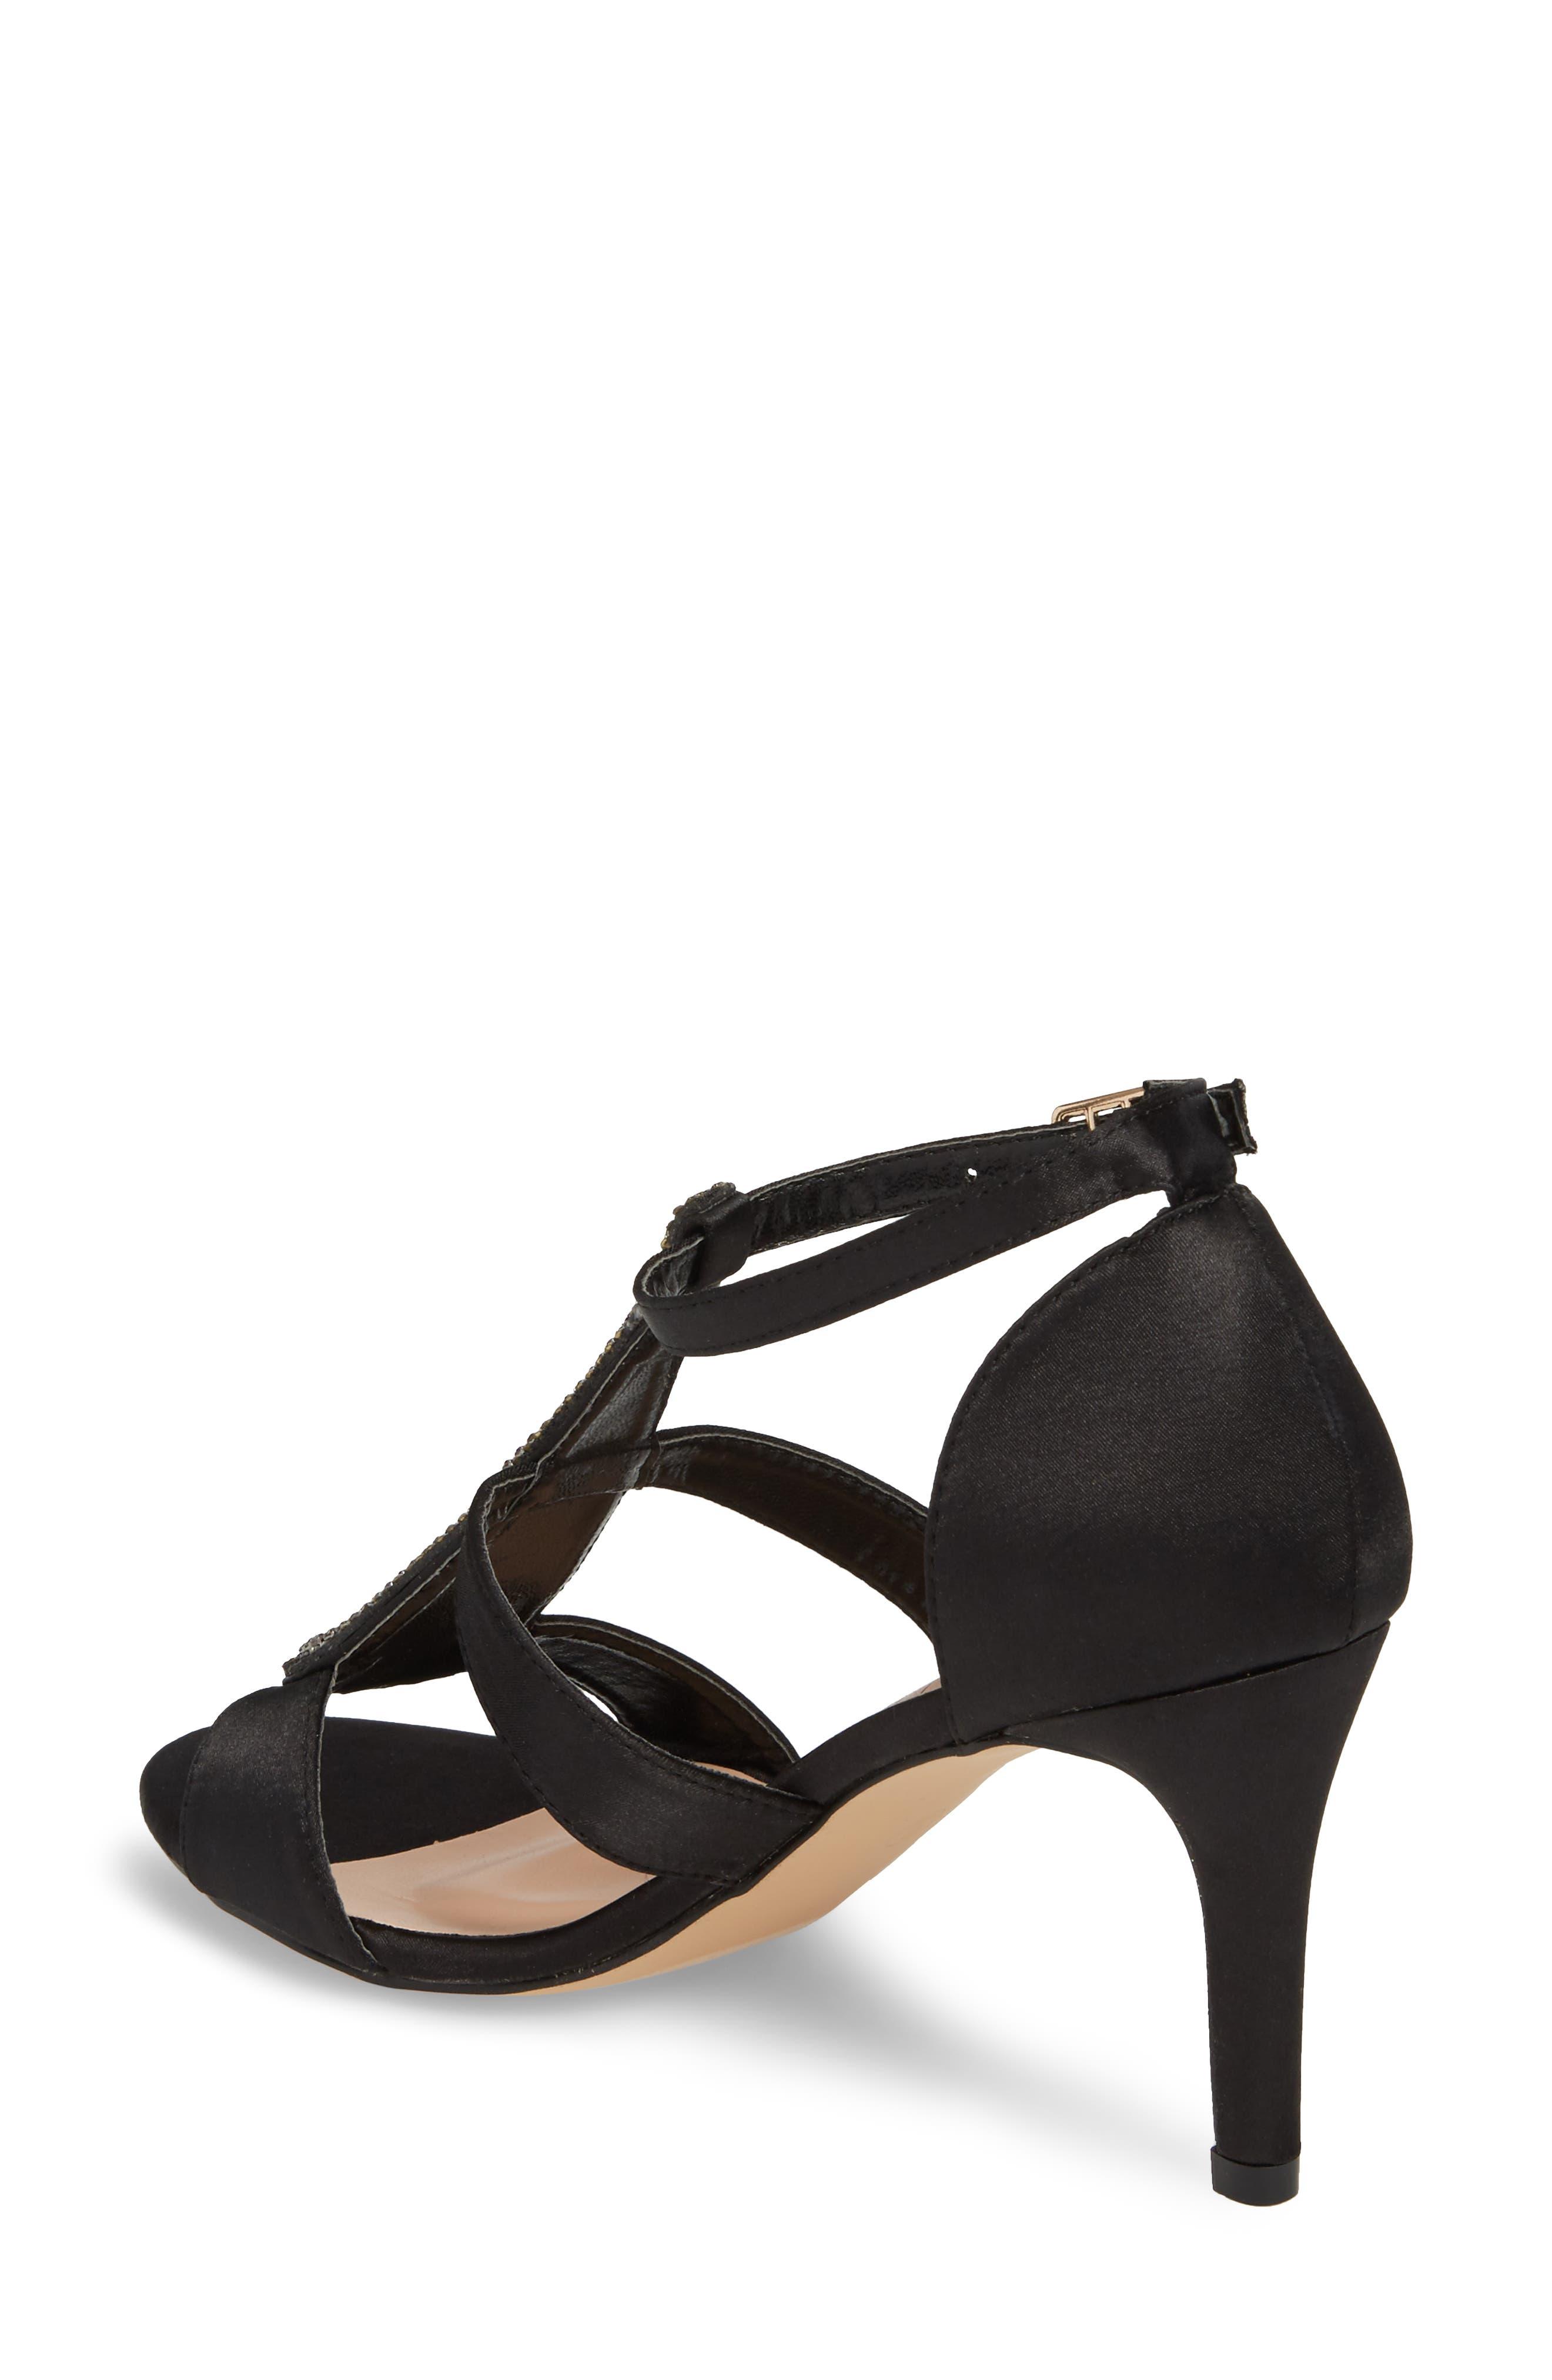 Ritz Crystal Embellished Sandal,                             Alternate thumbnail 2, color,                             BLACK FABRIC